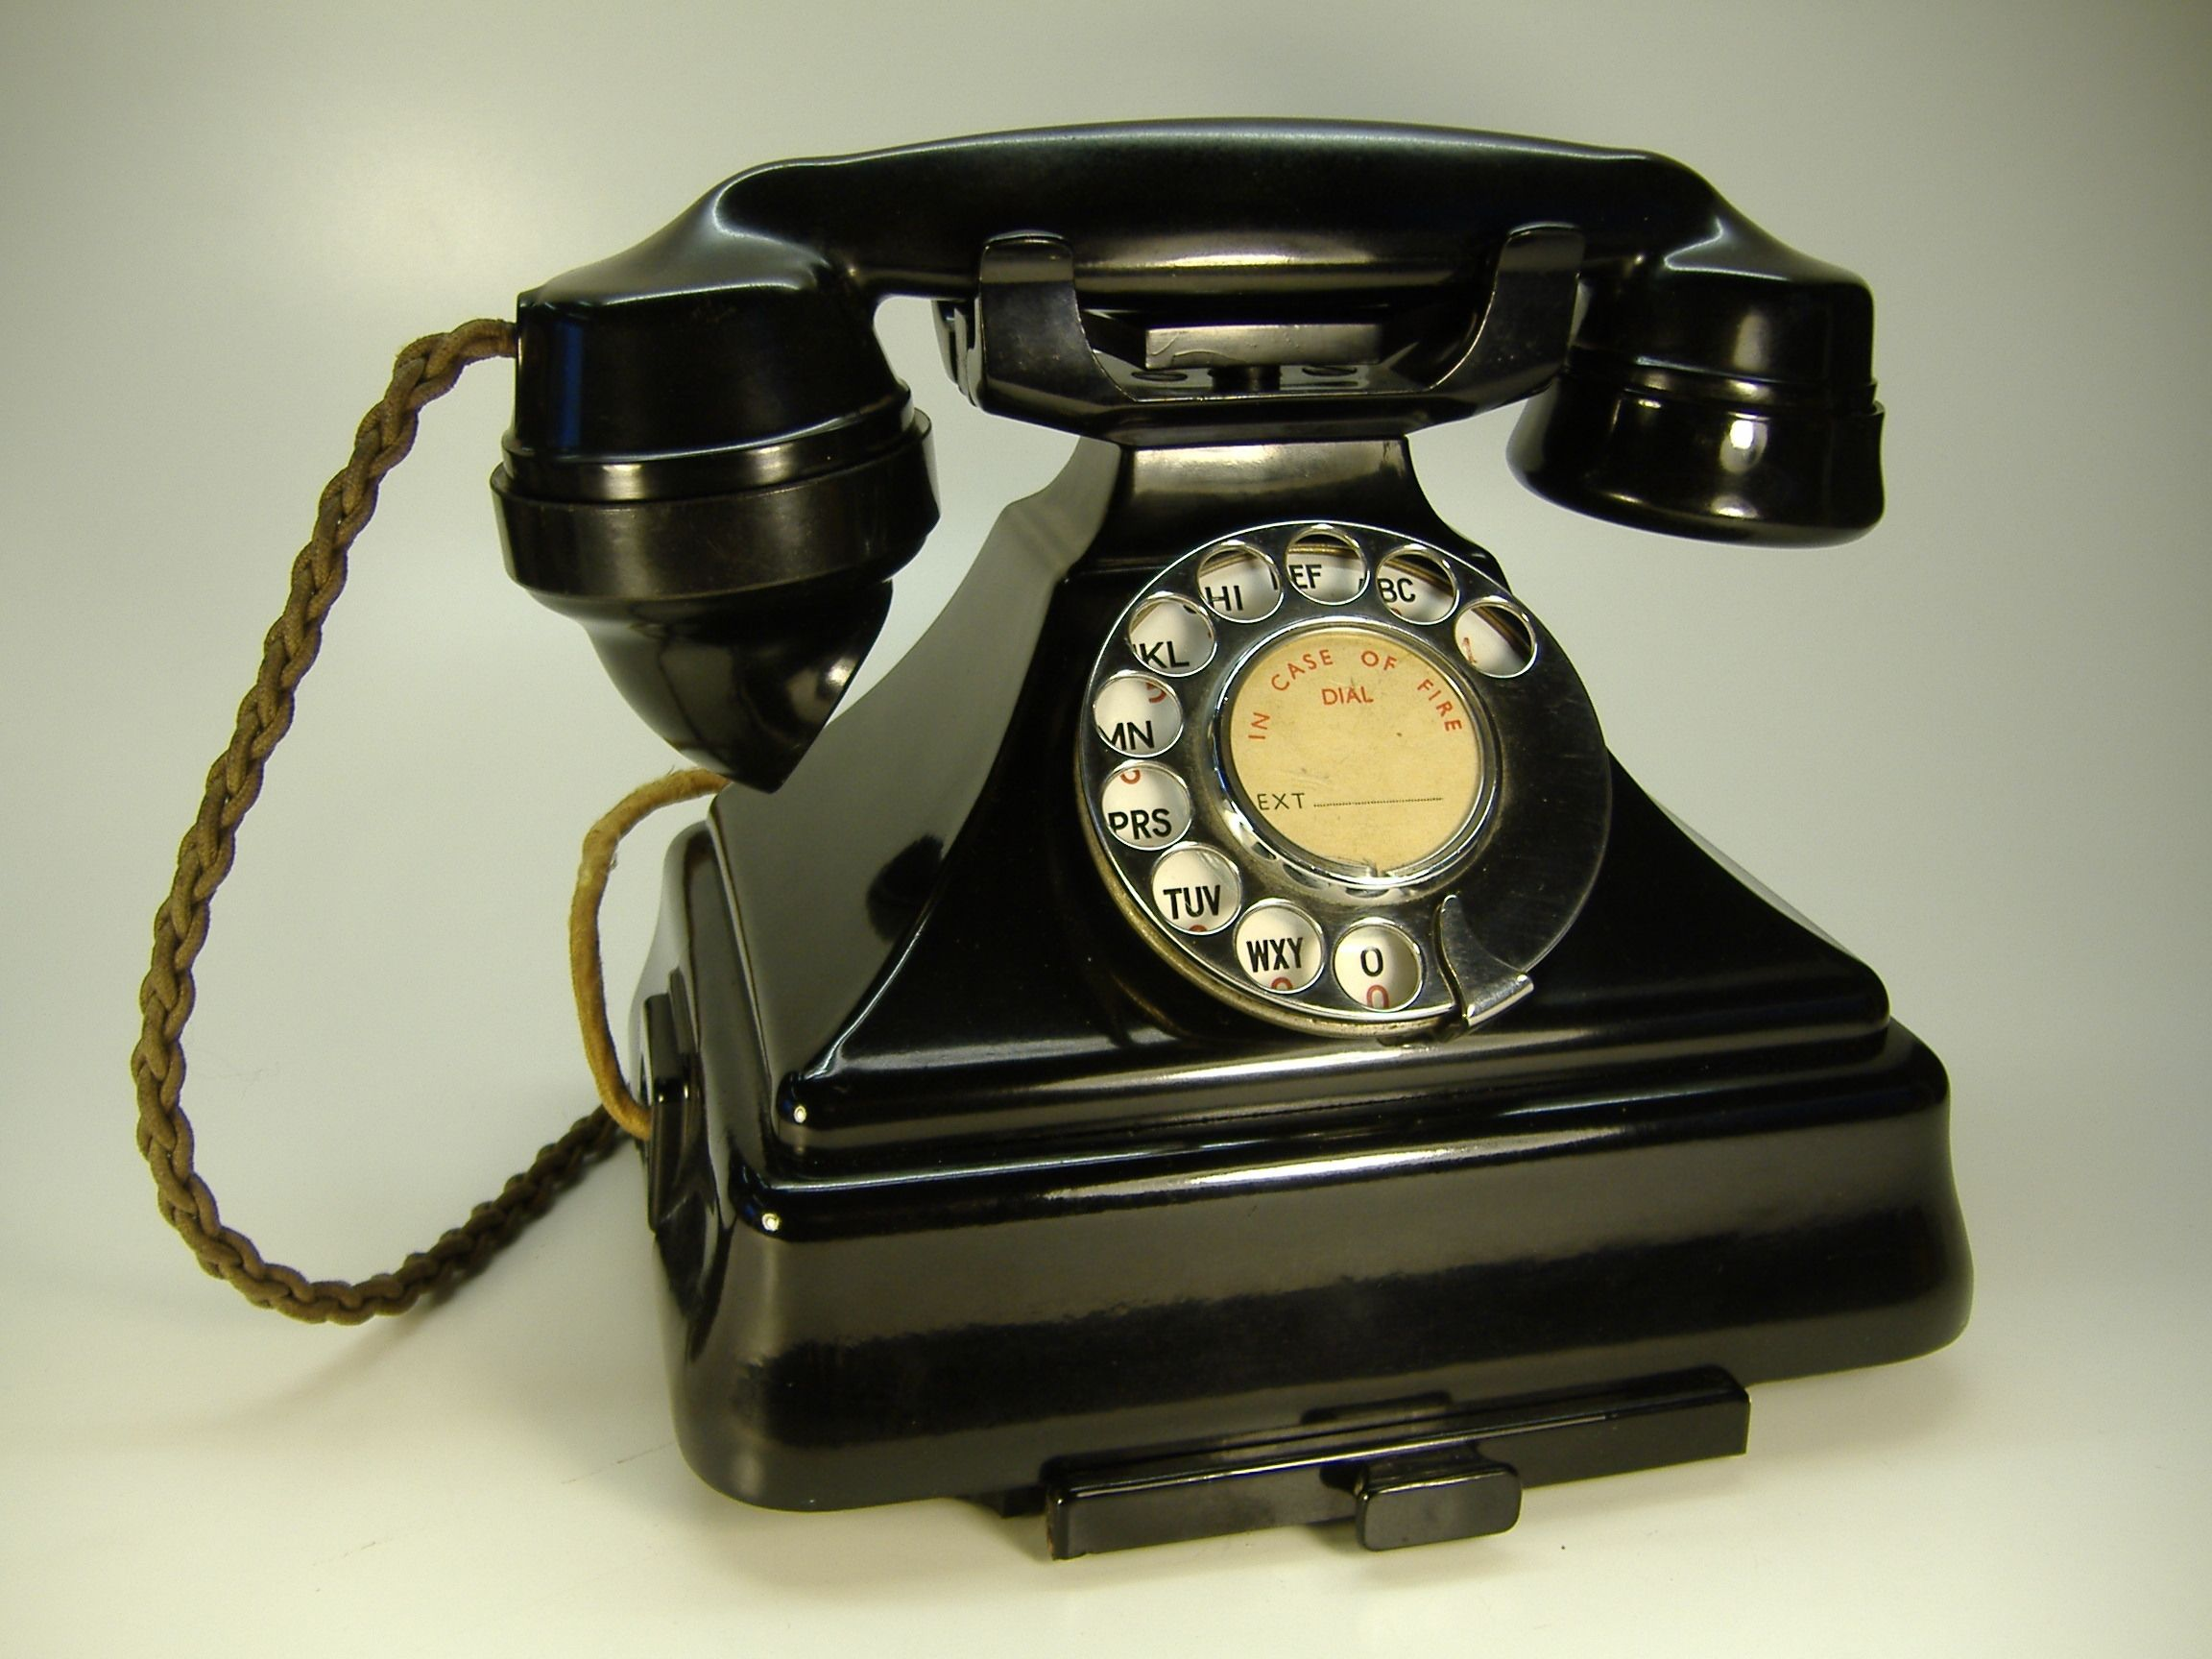 bakelite 200 series telephone telephone vintage vintage phones antique phone retro phone  [ 2304 x 1728 Pixel ]